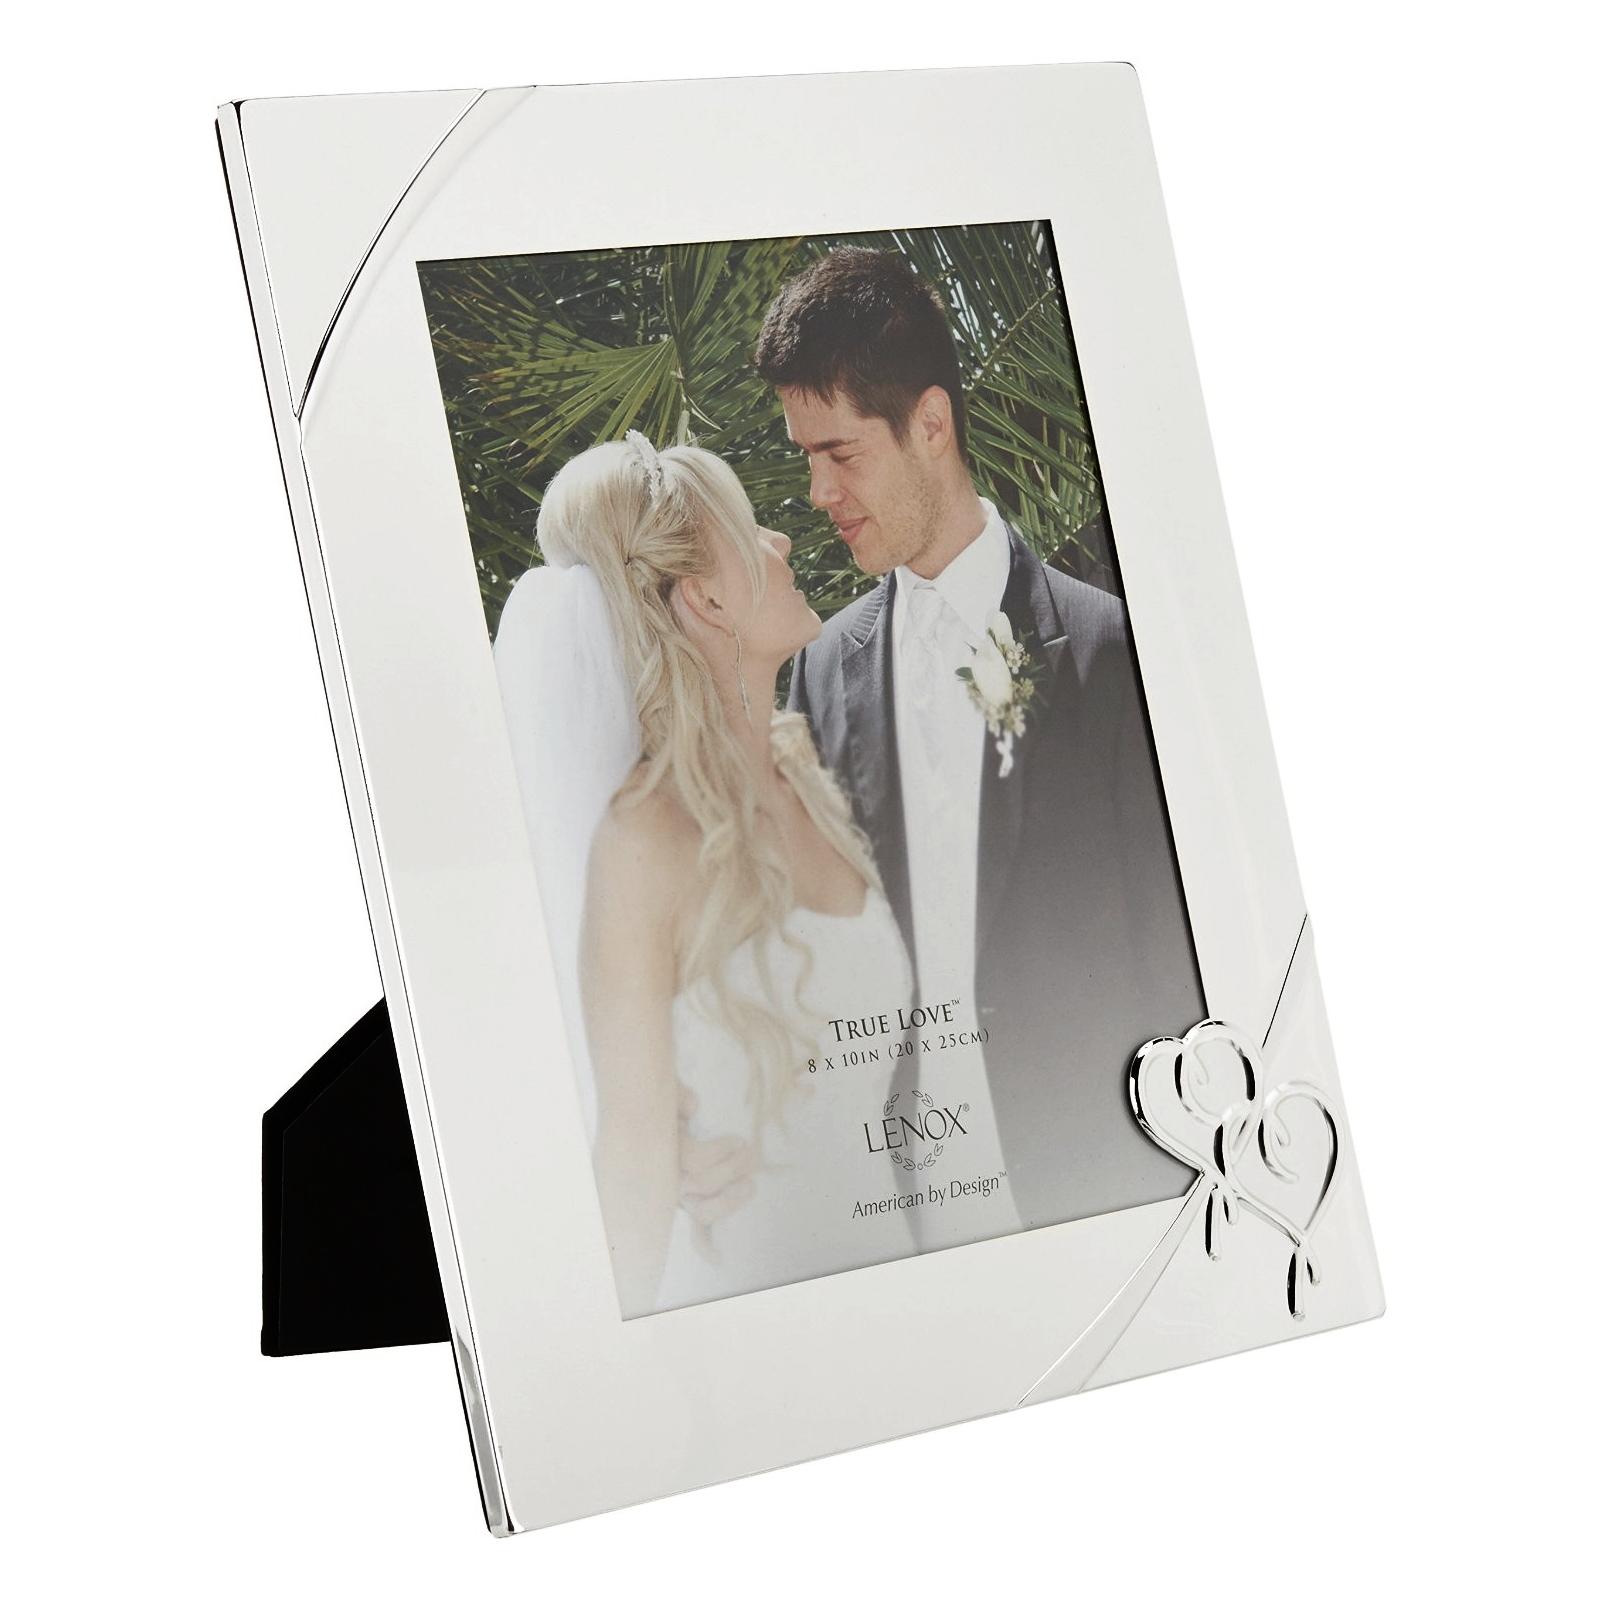 Lenox True Love 8 x 10 Inch Picture Frame